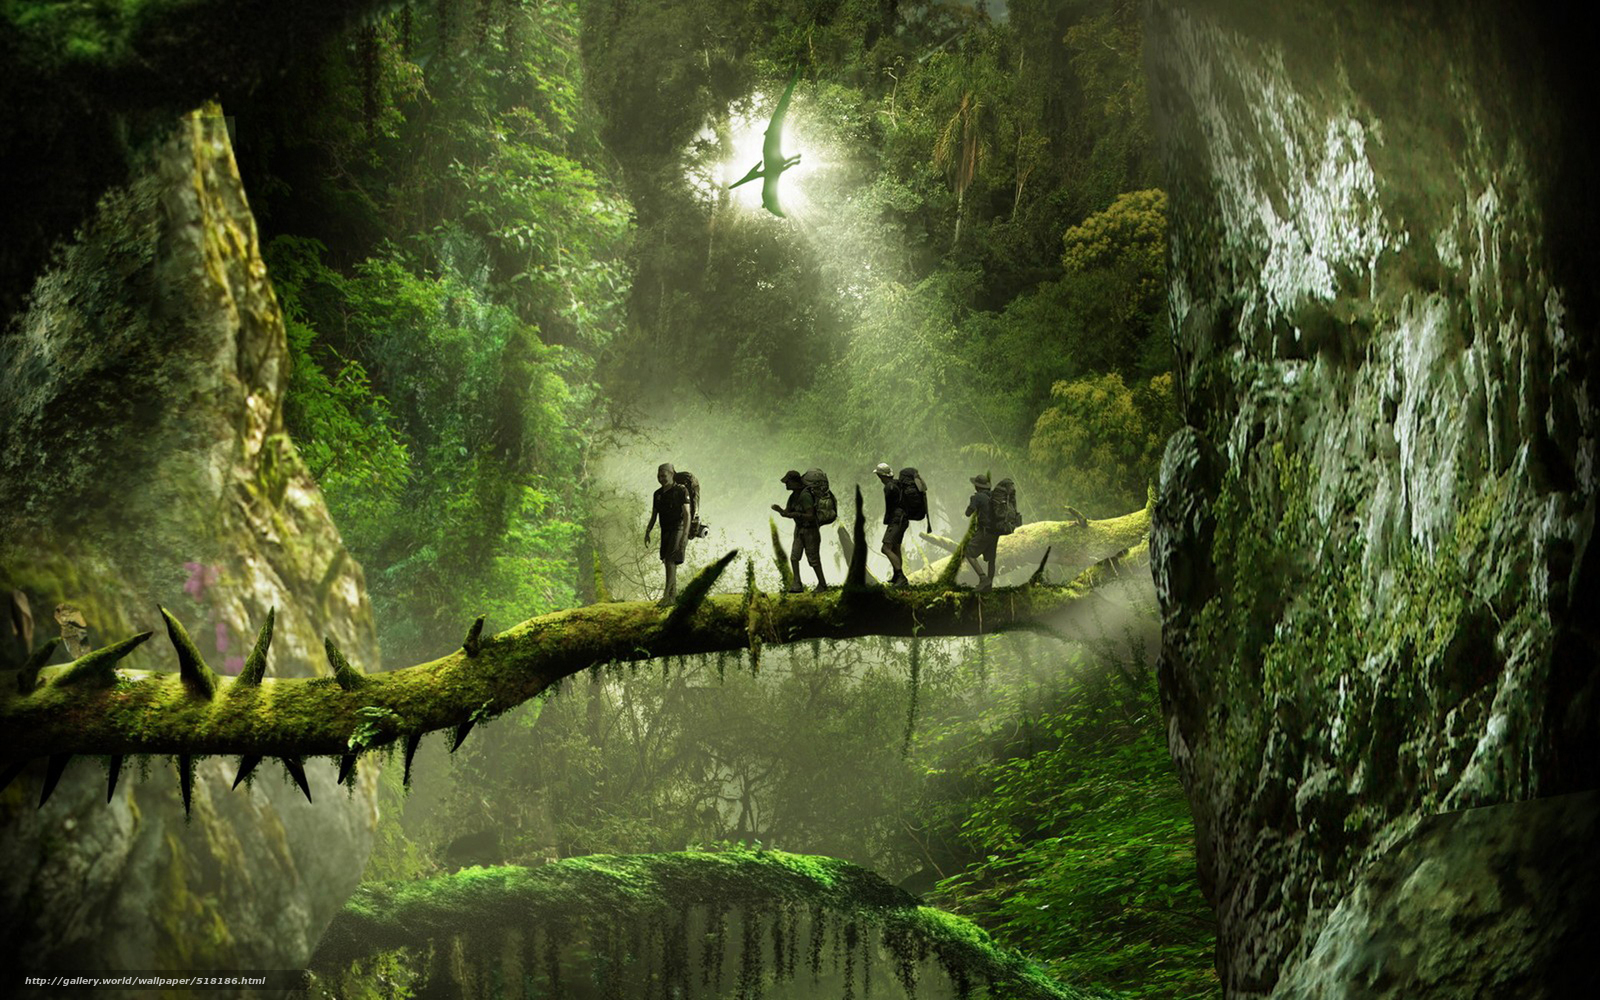 wallpaper nature The Dinosaur jungle desktop wallpaper 1600x1000